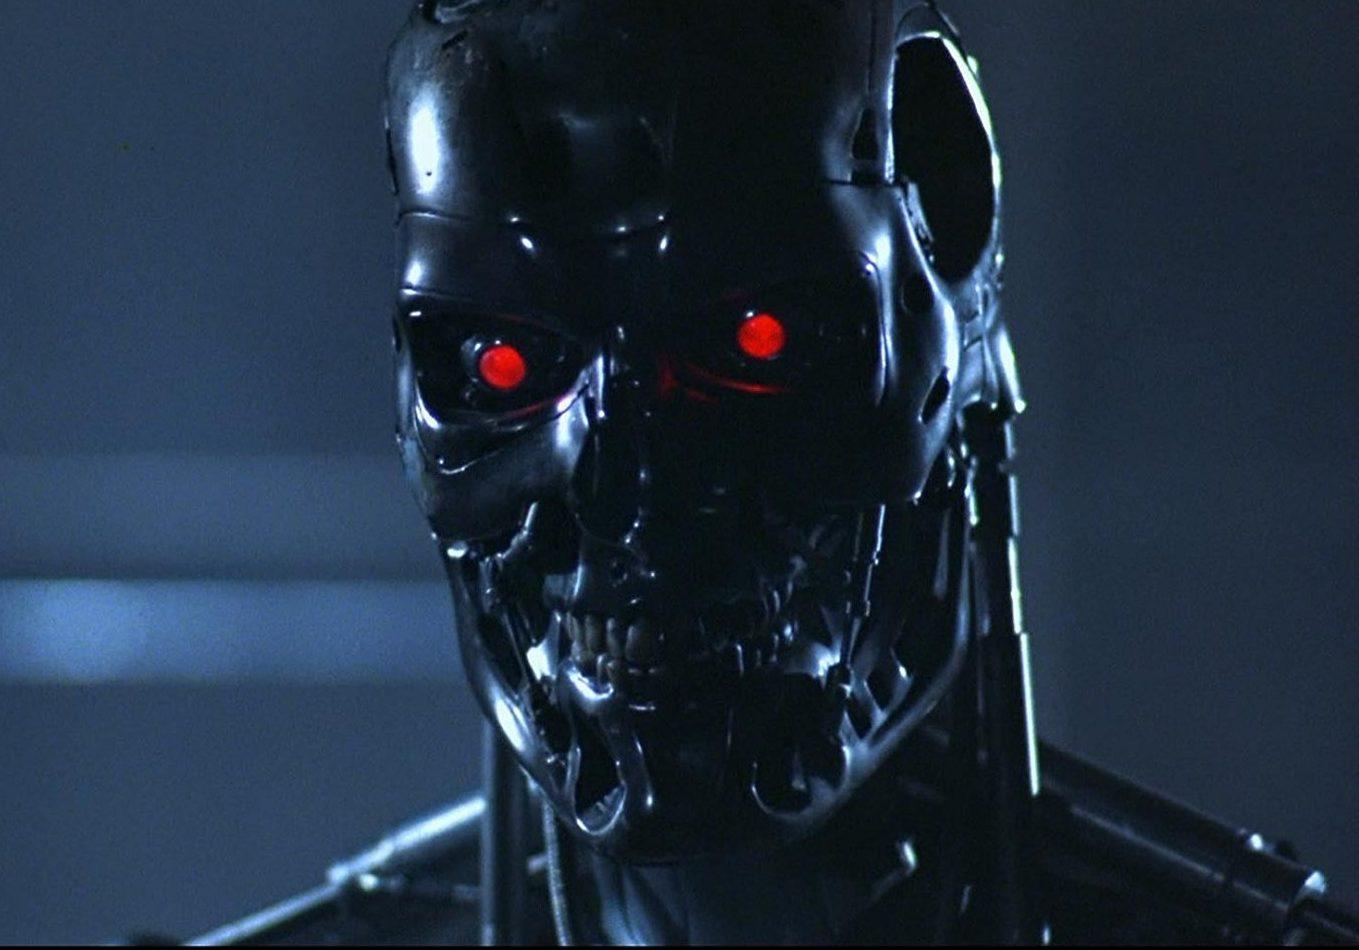 MV5BNDQ4MWZhYmMtM2I5YS00Mzg3LTg4NGItNGM4MDQxMjA1MmNhXkEyXkFqcGdeQXZ3ZXNsZXk@. V1 e1626351431853 20 Things You Might Not Have Realised About The Terminator